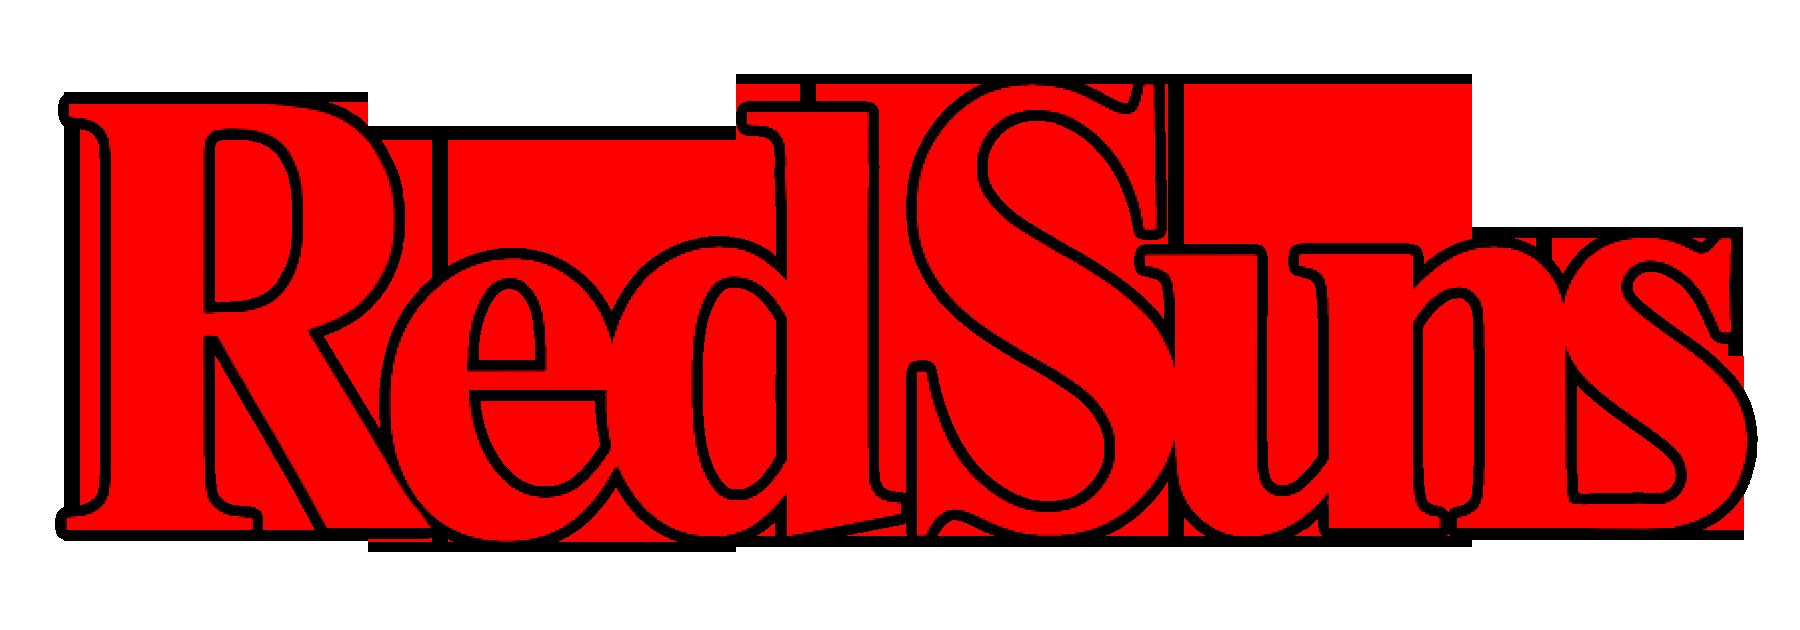 Initial D Akagi Red Suns Logo By Cruzerblade1029 On